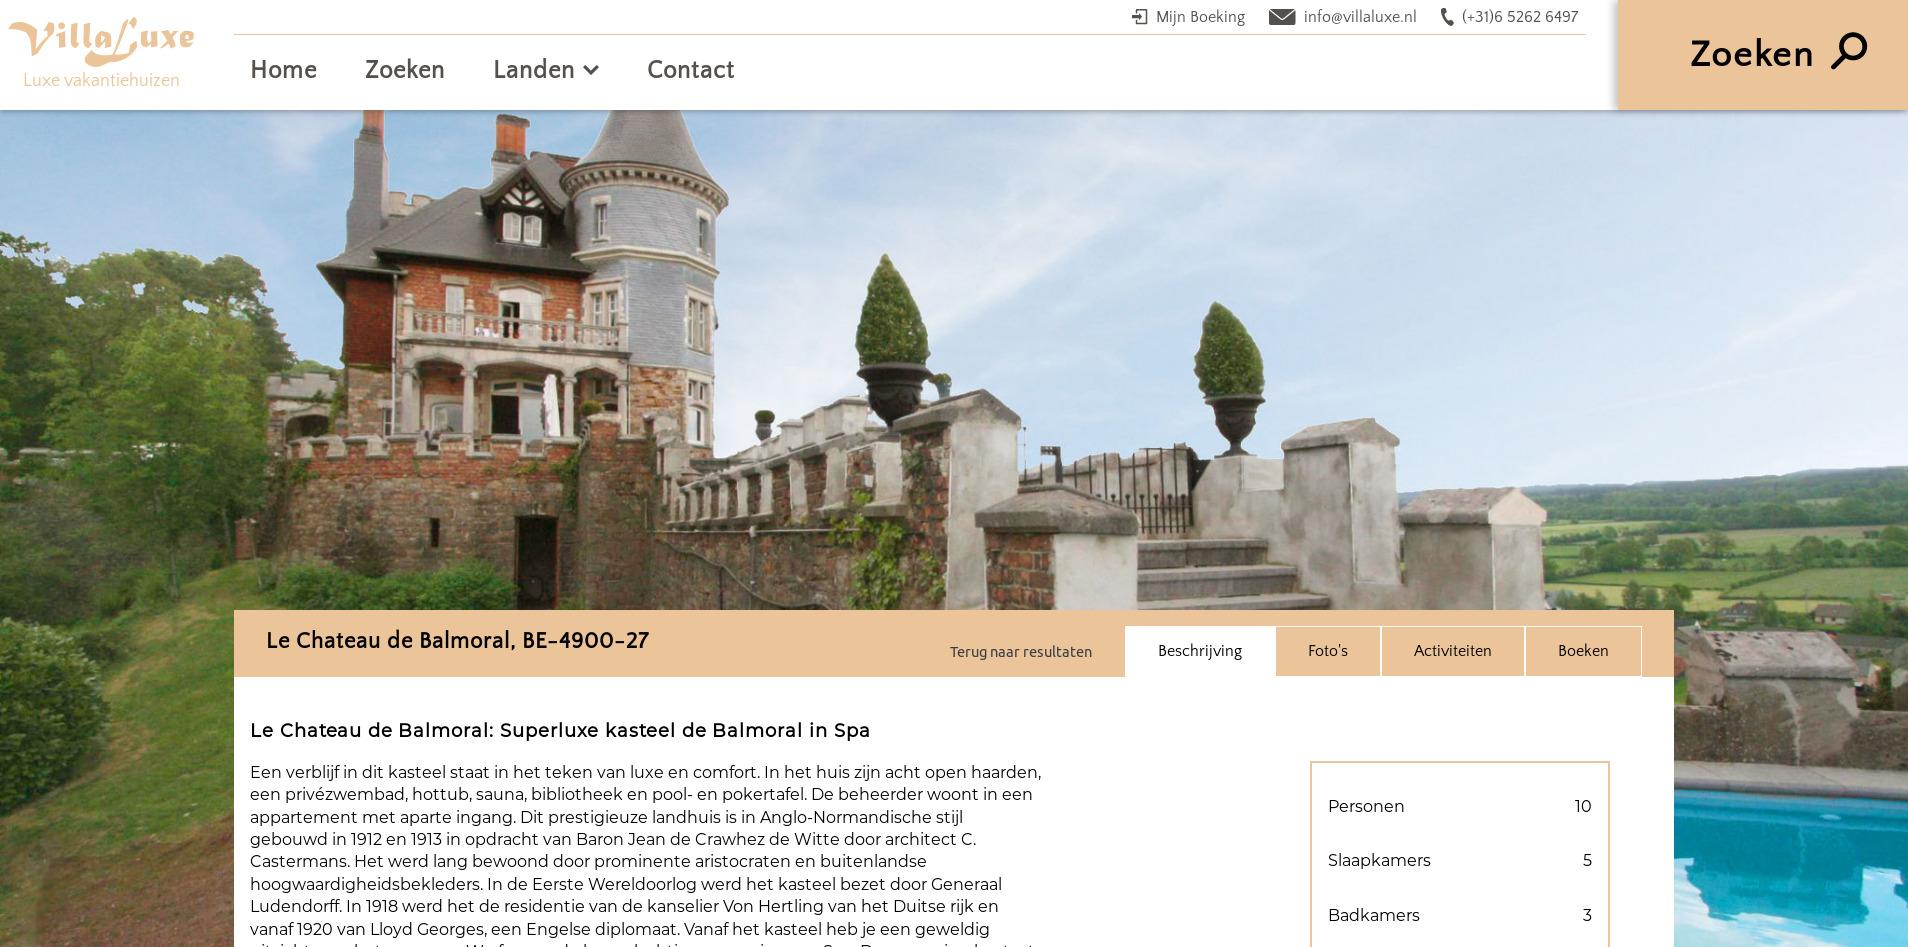 Screenshot_2019-01-23 VillaLuxe Le Chateau de Balmoral.jpg